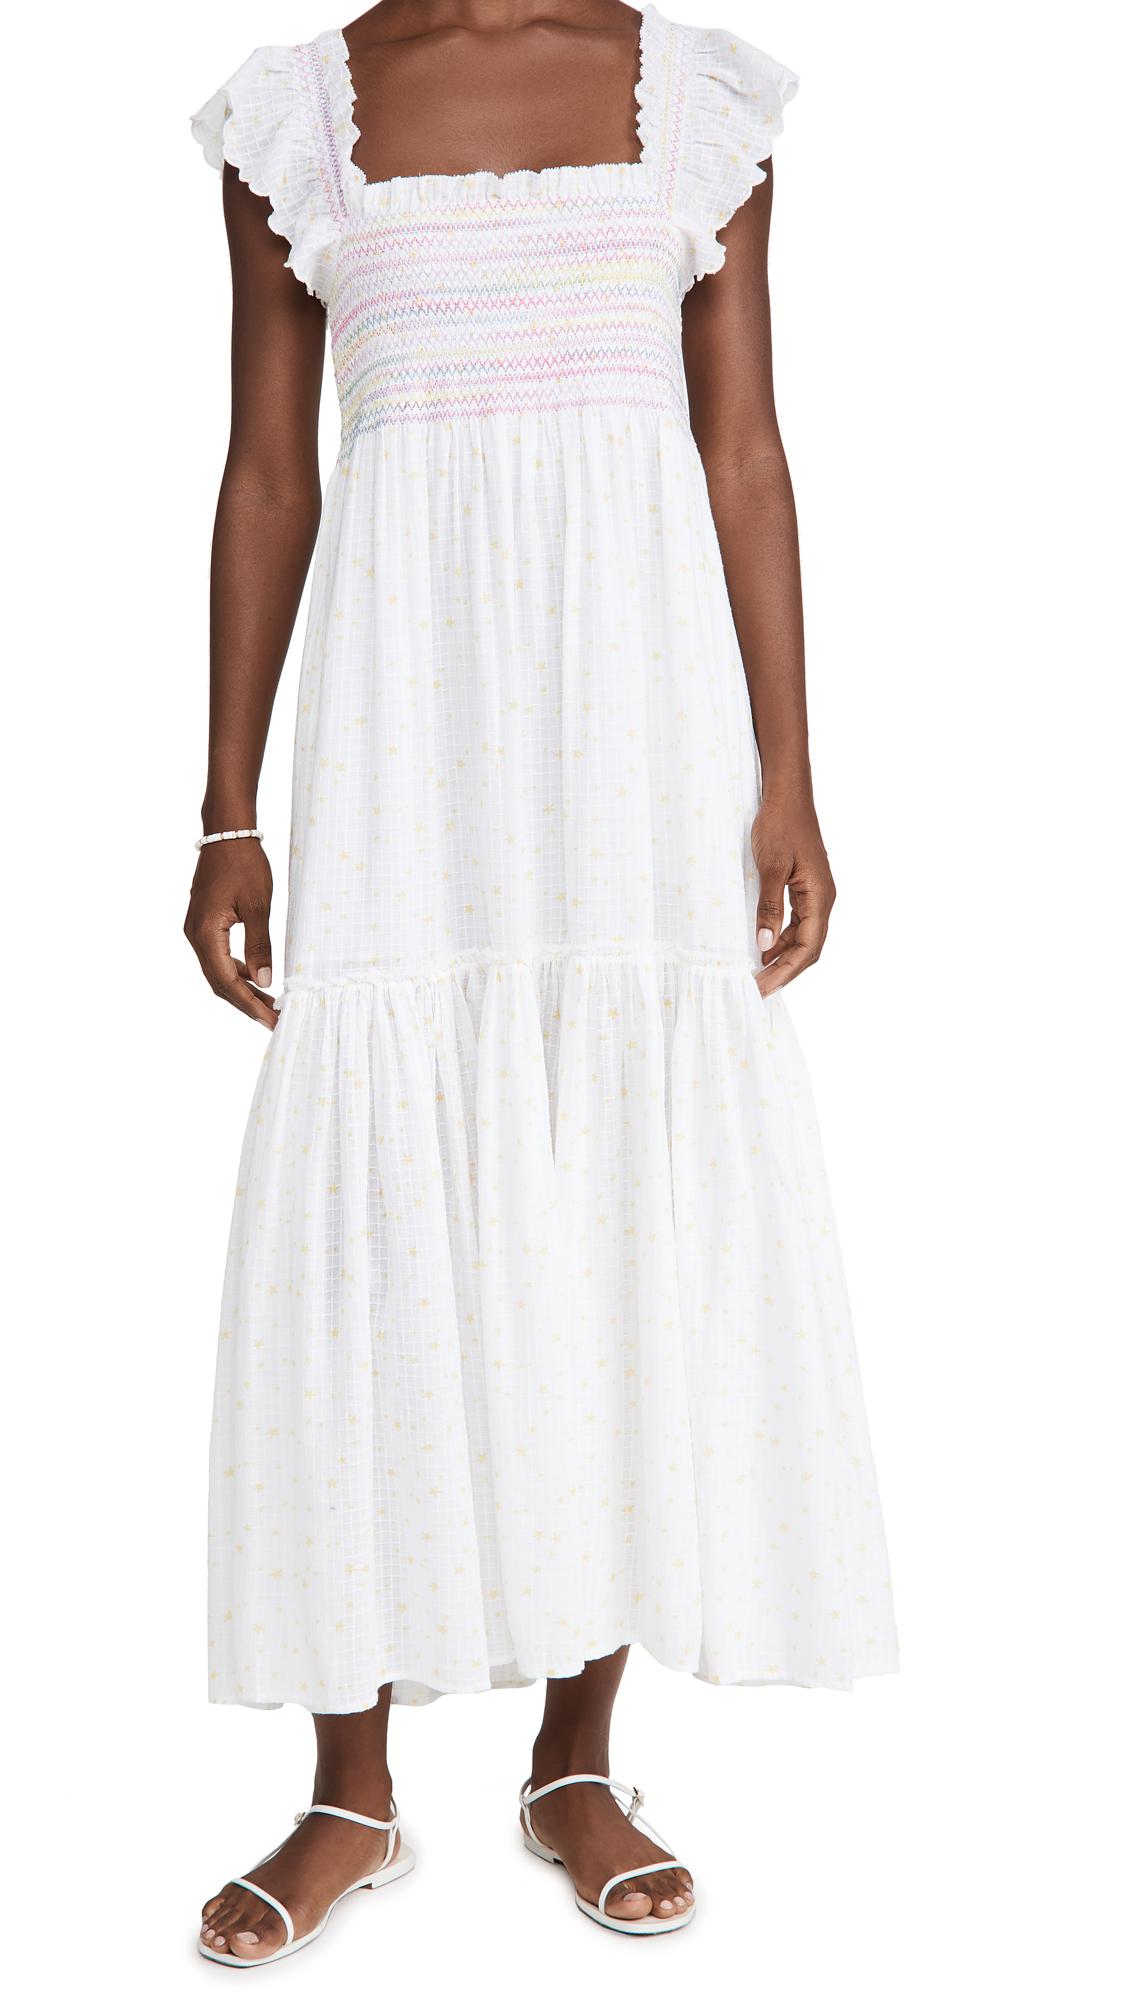 LOVESHACKFANCY Constantine Dress